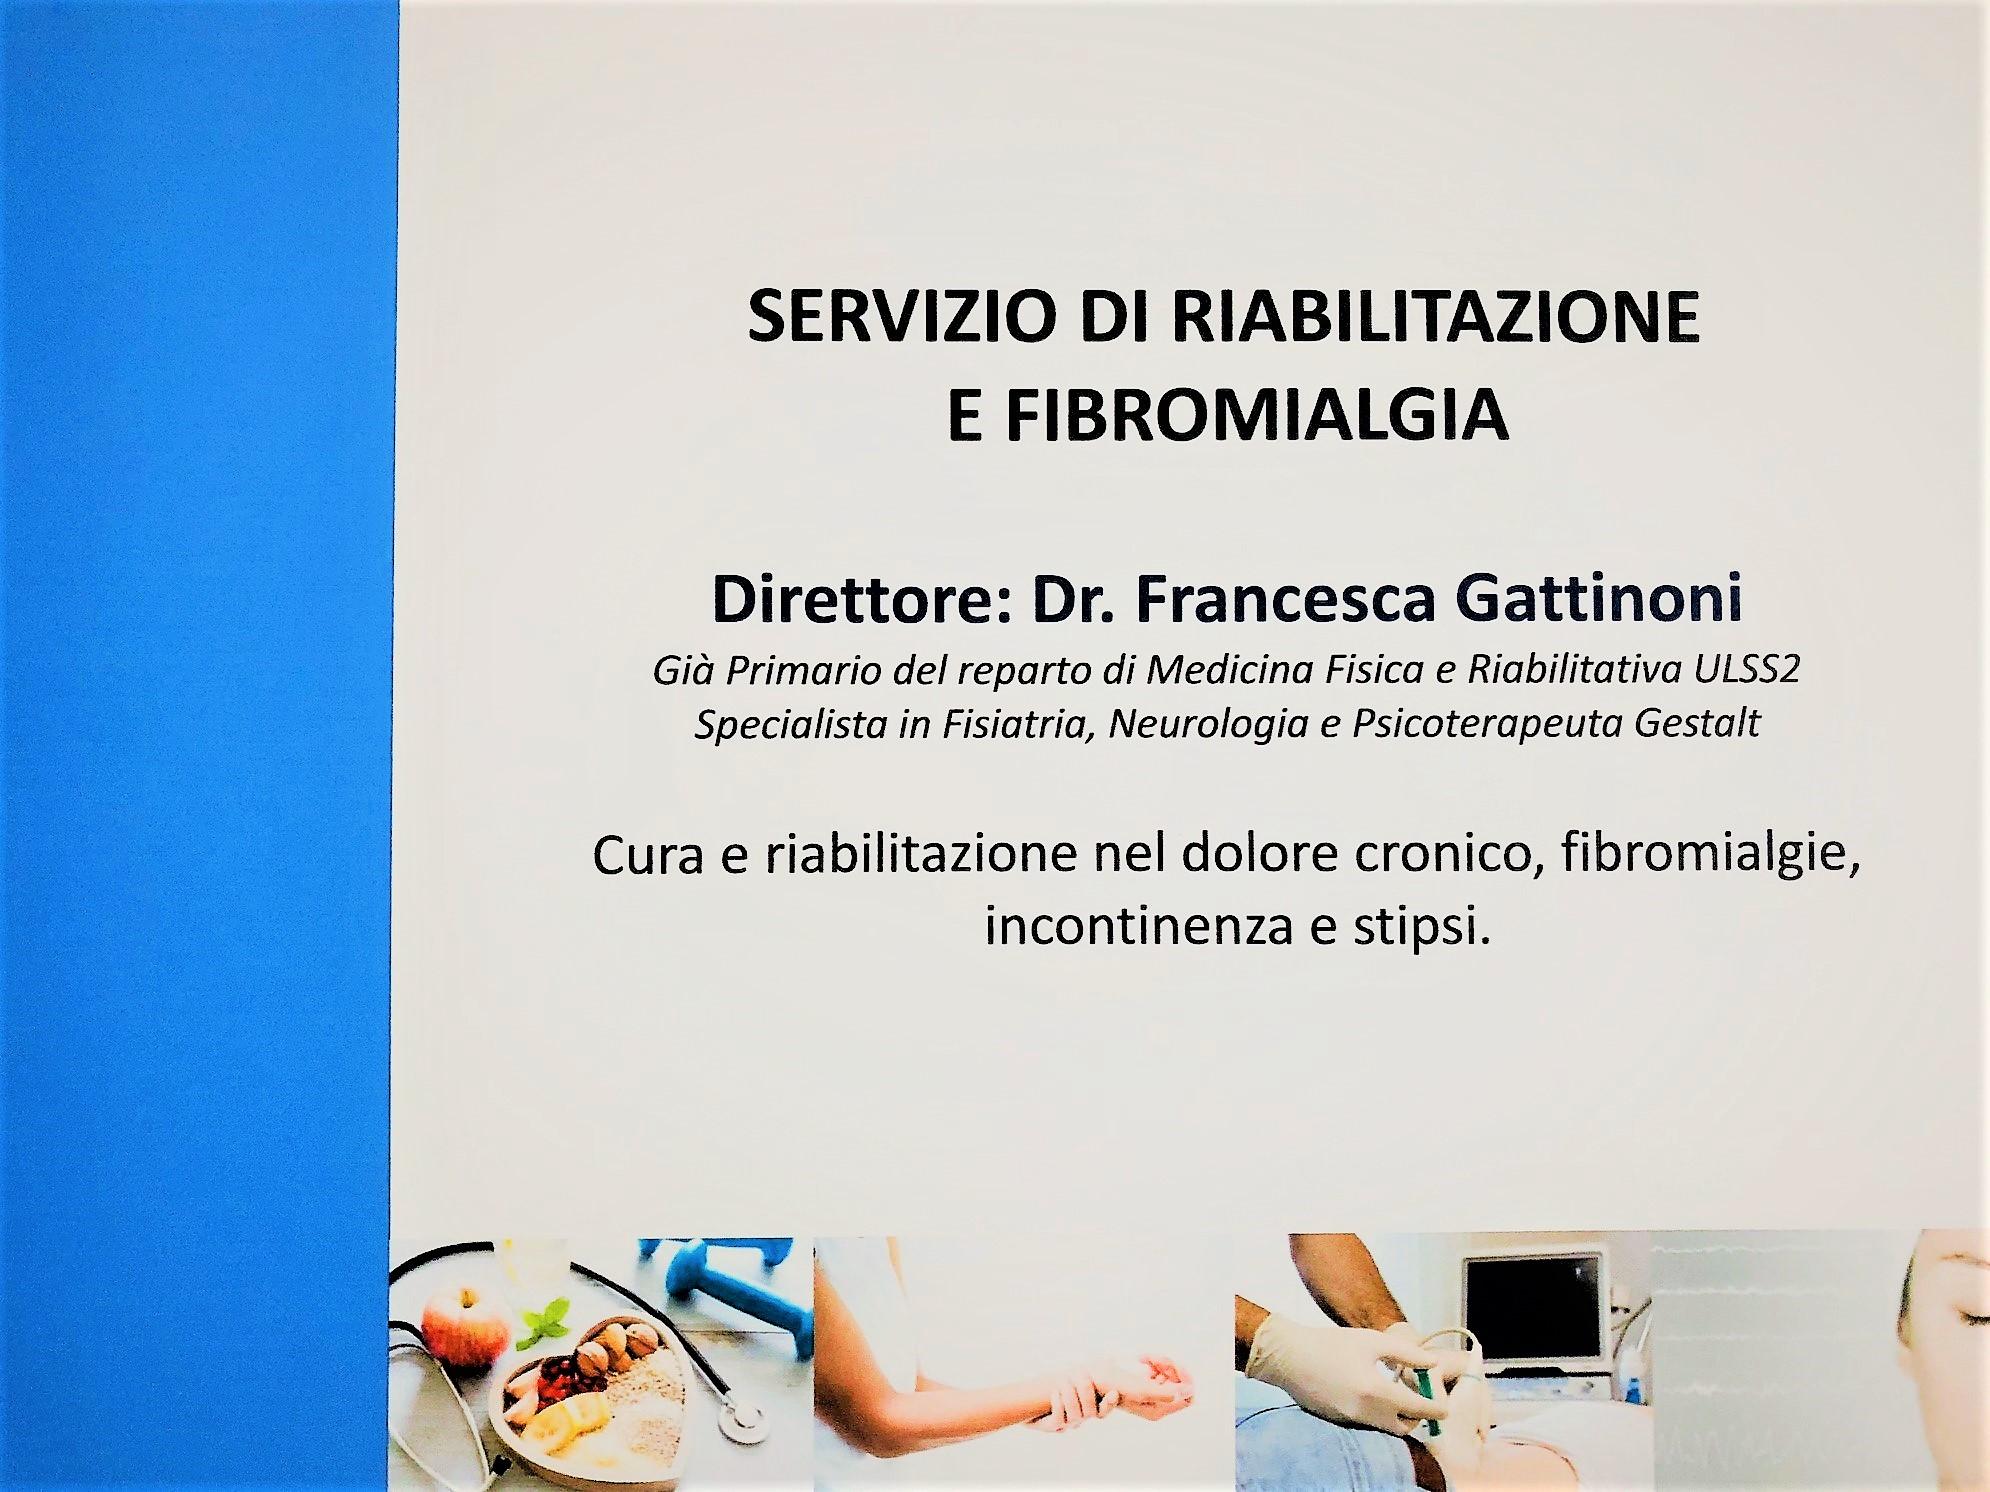 REHABILITATION AND FIBROMYALGIA SERVICE dr. Francesca Gattinoni